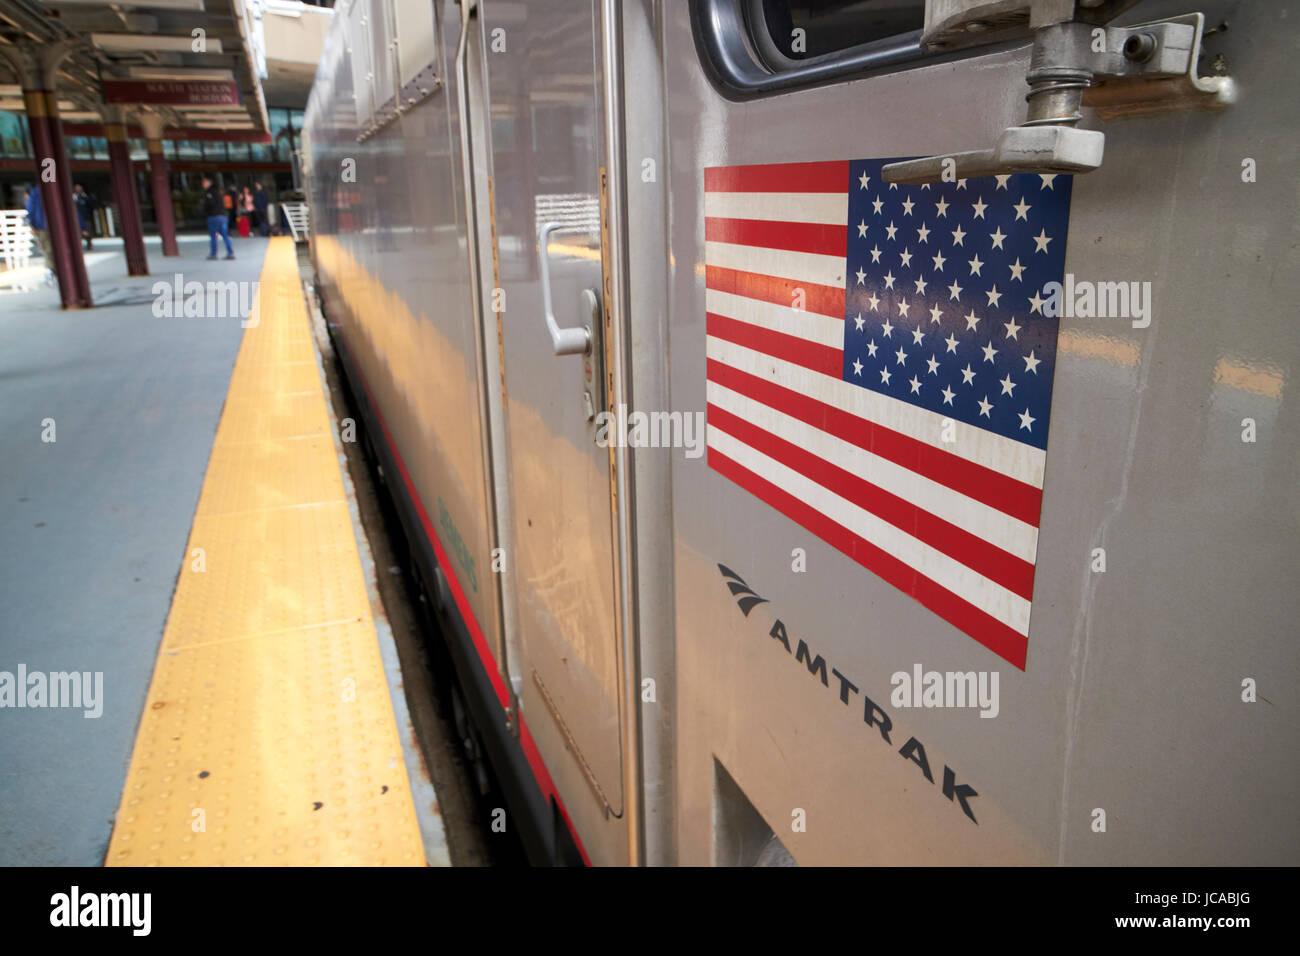 amerikanische Flagge auf Amtrak Siemens acs-64 regionale Zug Lok South Street Station Boston USA Stockbild